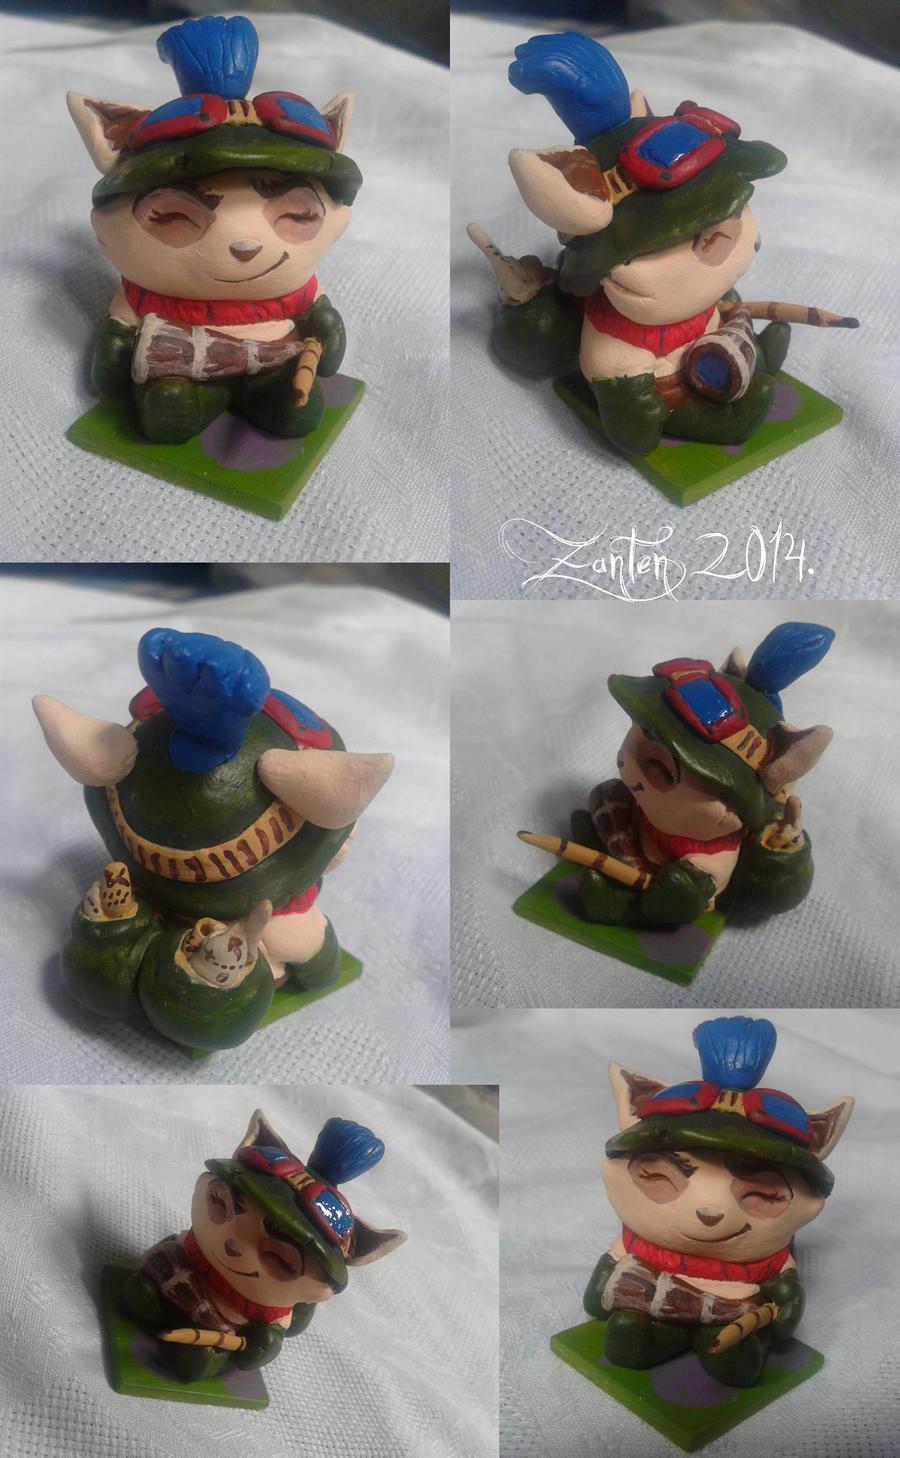 Captain Teemo figurine by Zanten